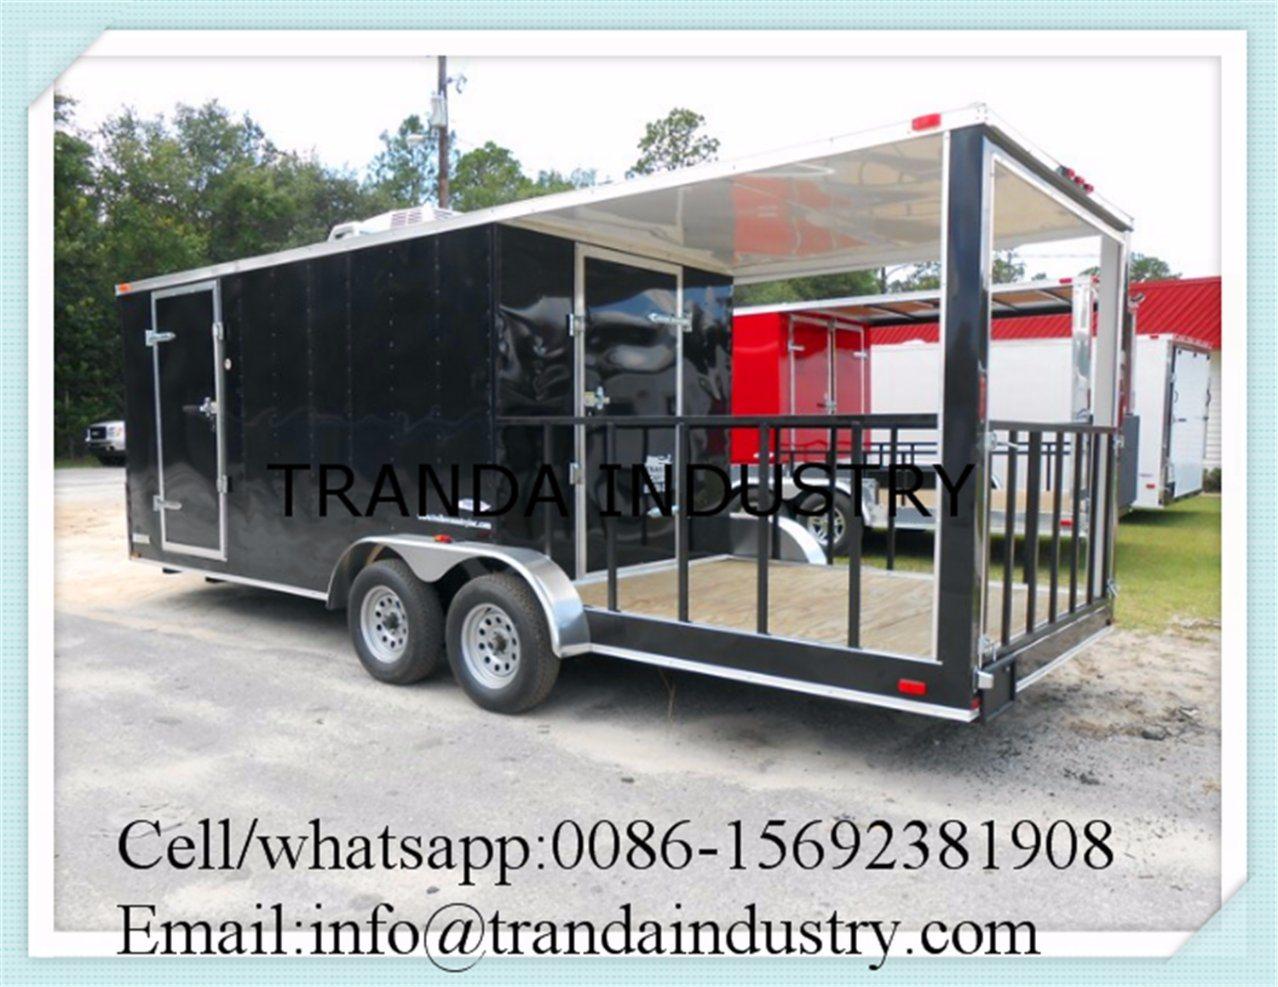 New Mobile Food Trailer Food Cart Trailer